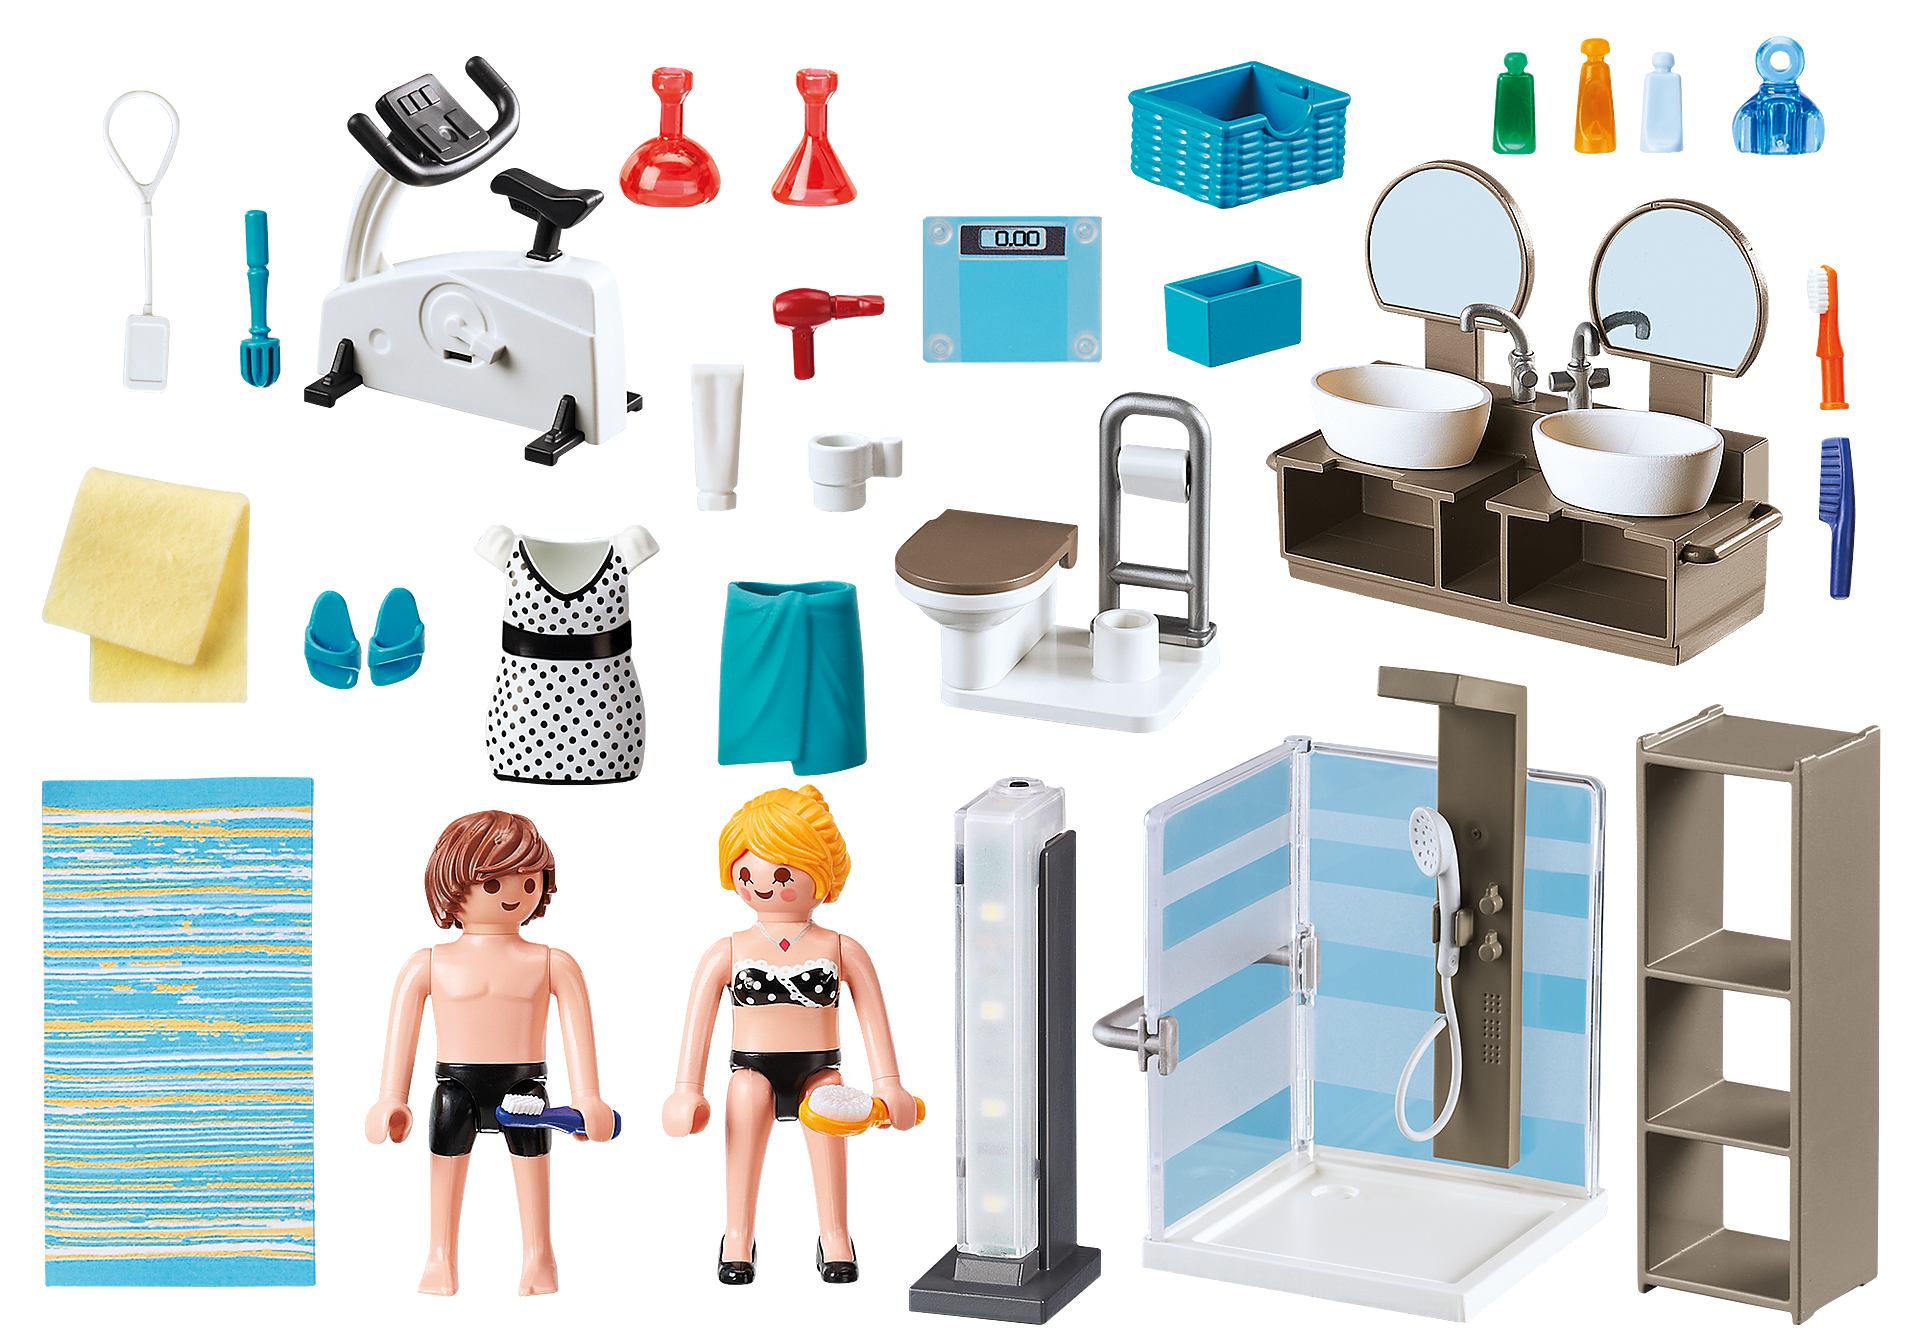 http://media.playmobil.com/i/playmobil/9268_product_box_back/Salle de bain avec douche à l'italienne